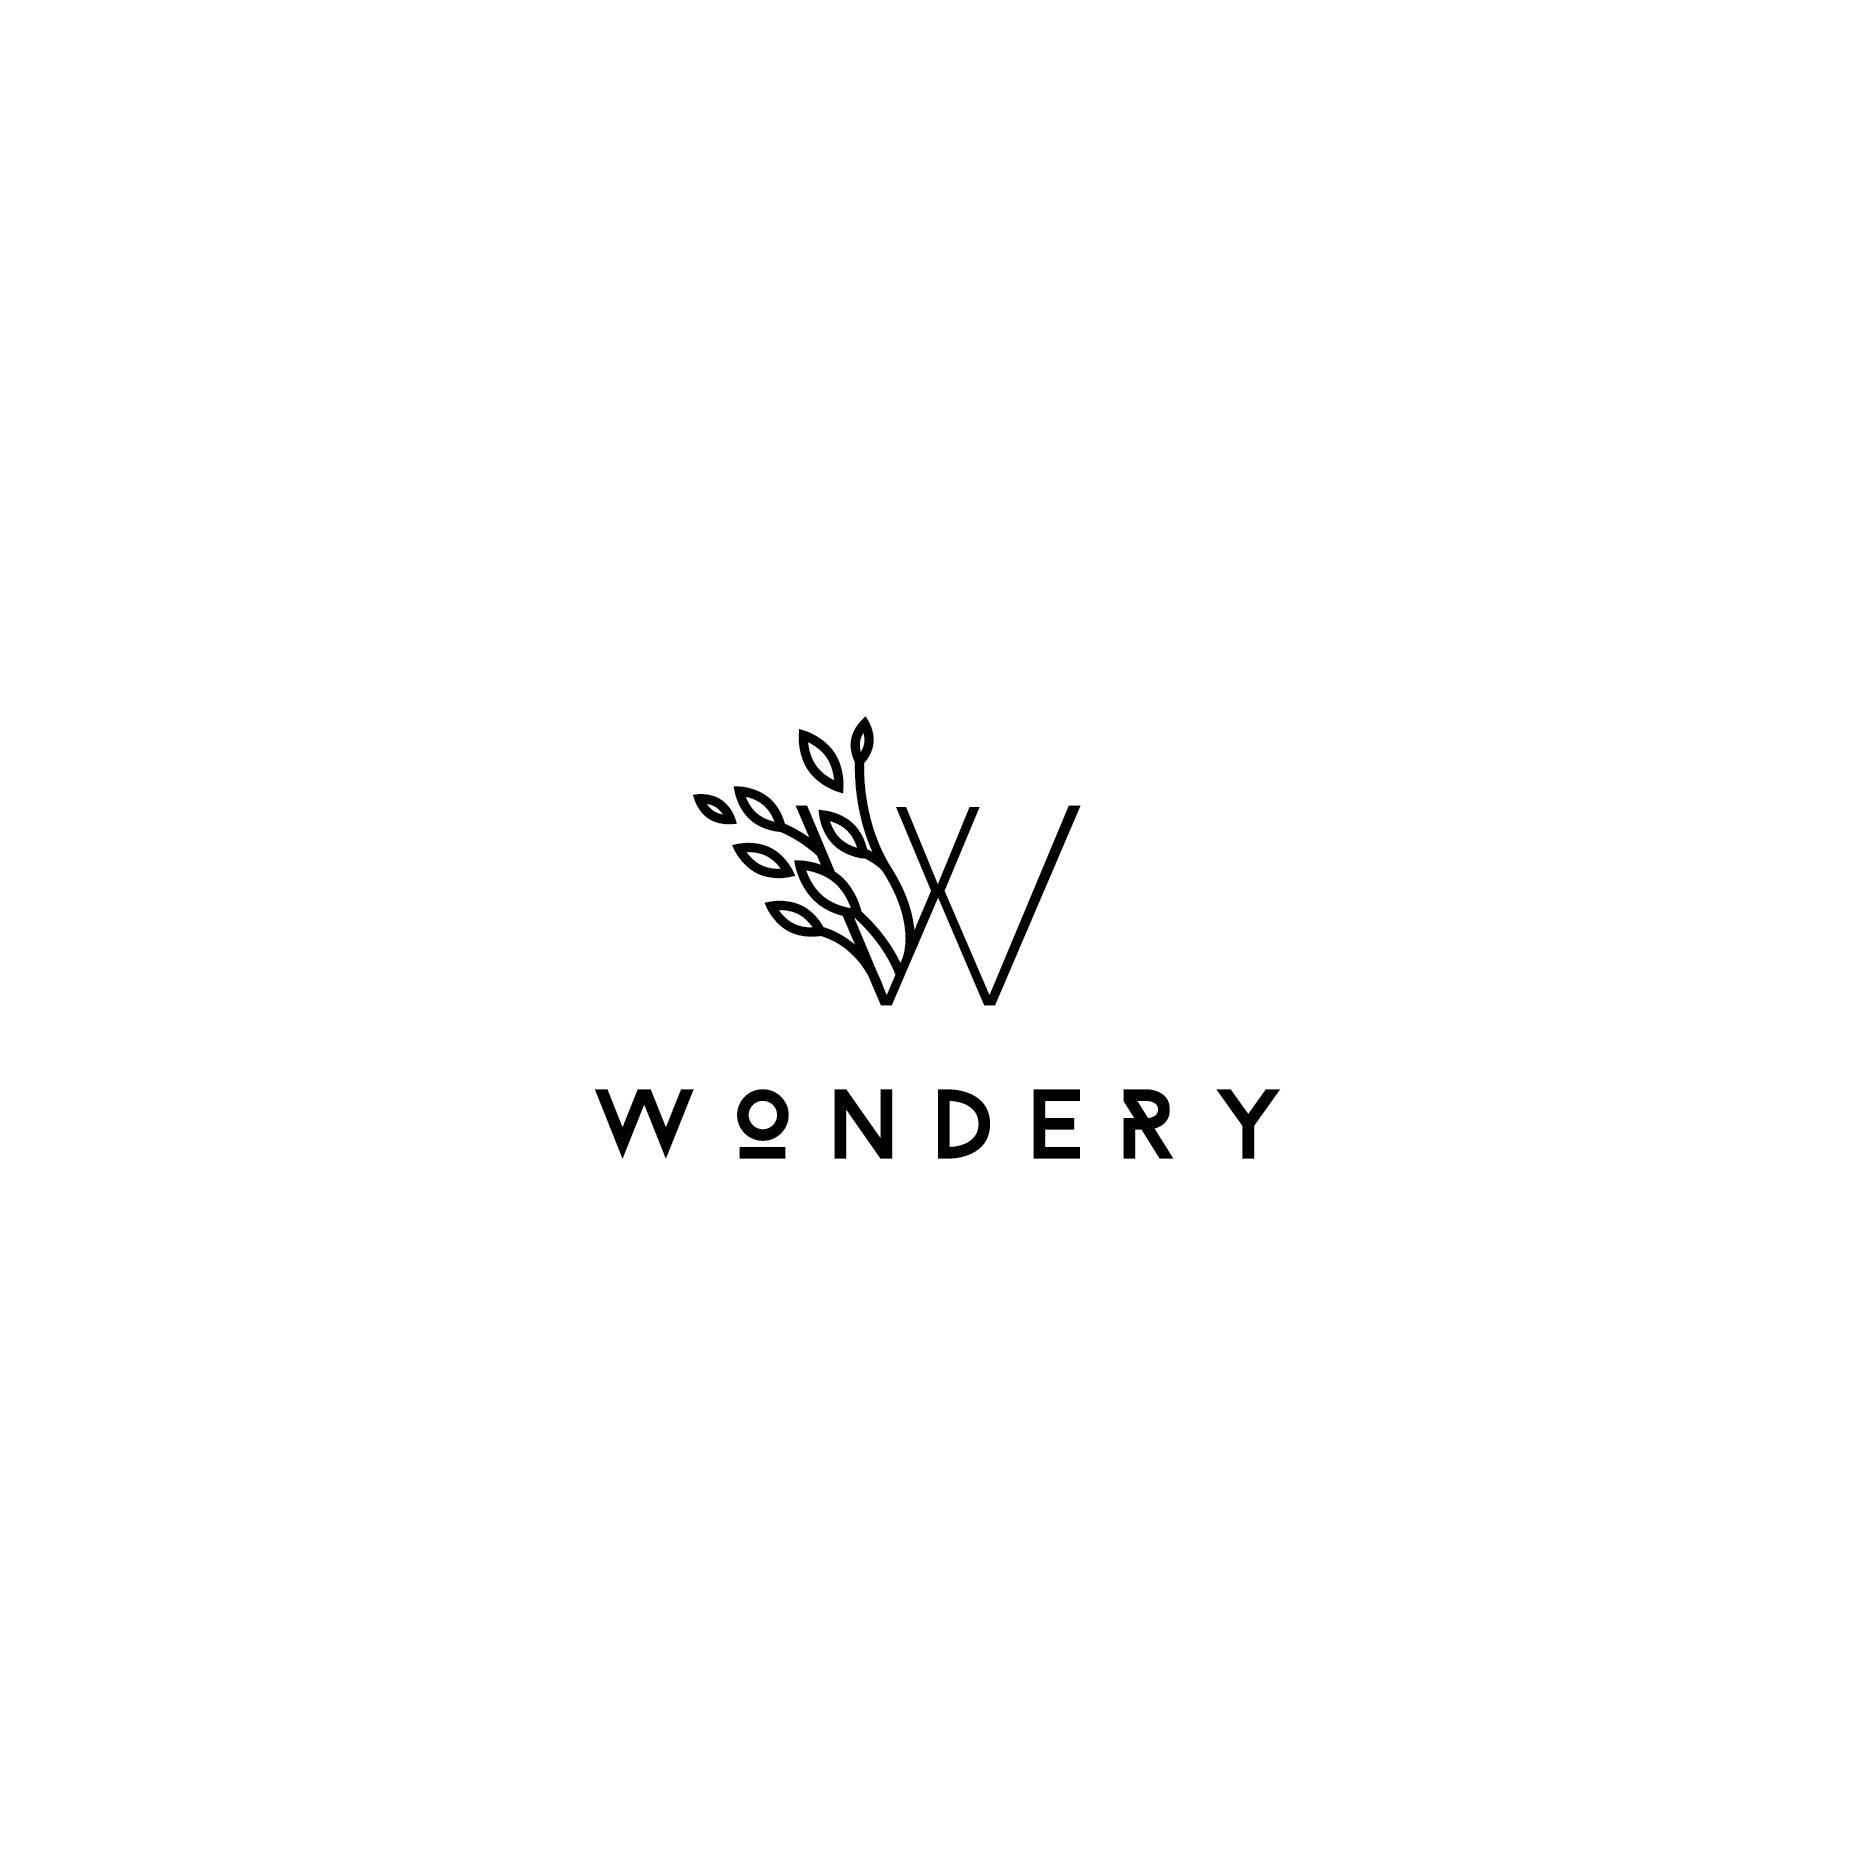 Wondery logo design